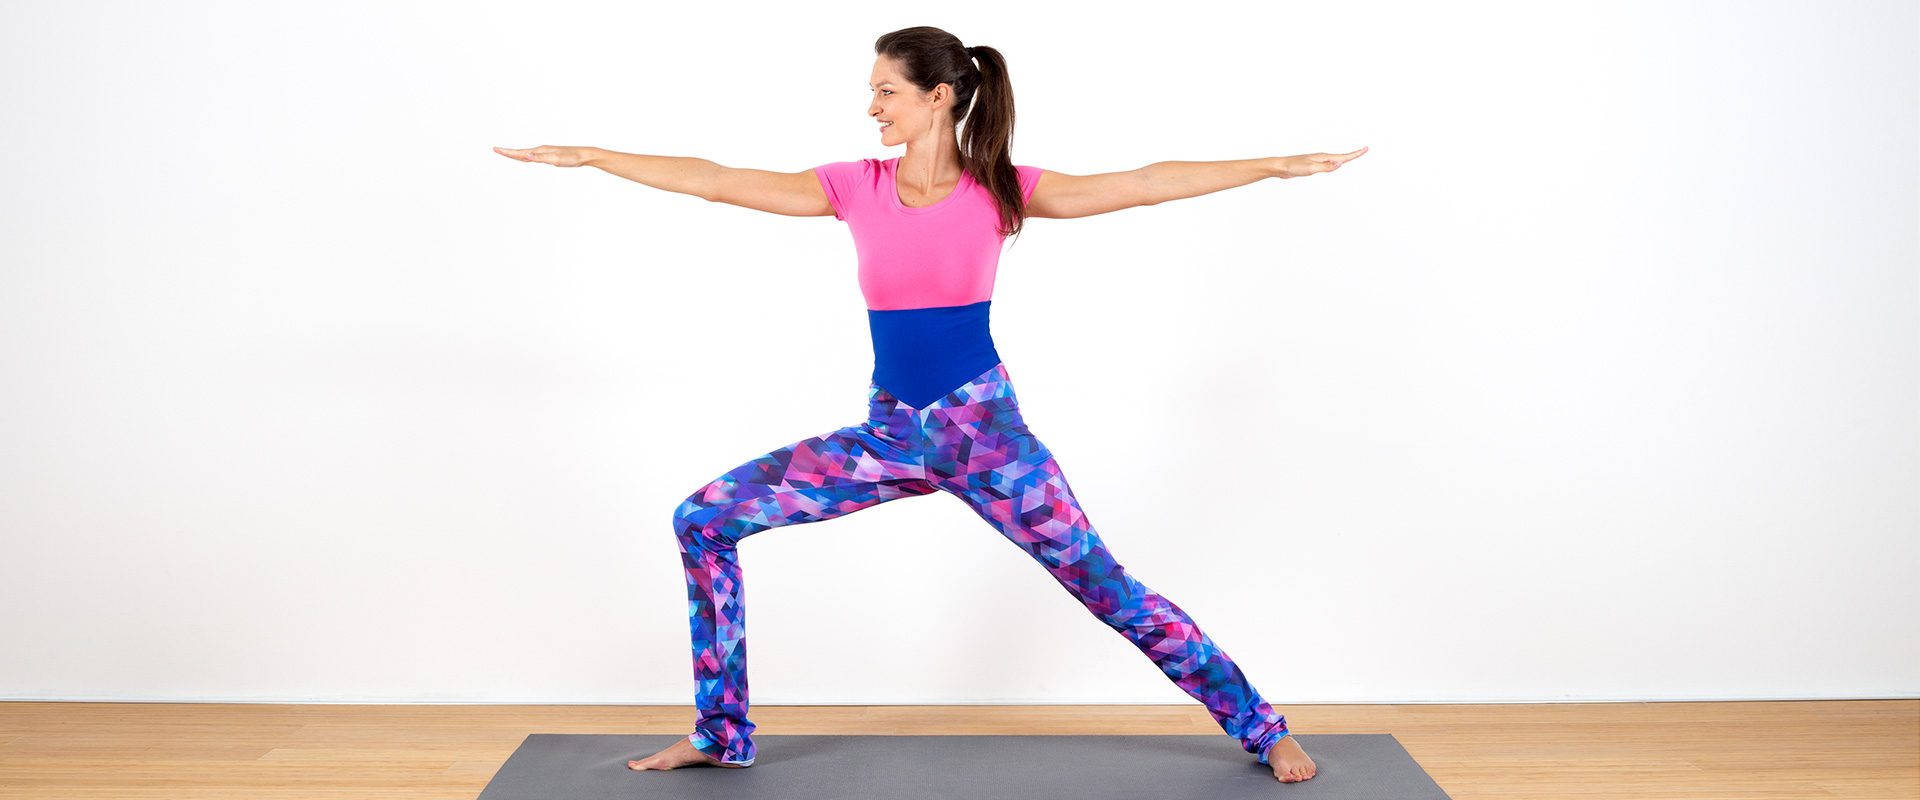 Legging Yoga Geometria Blau lila türkis petrol